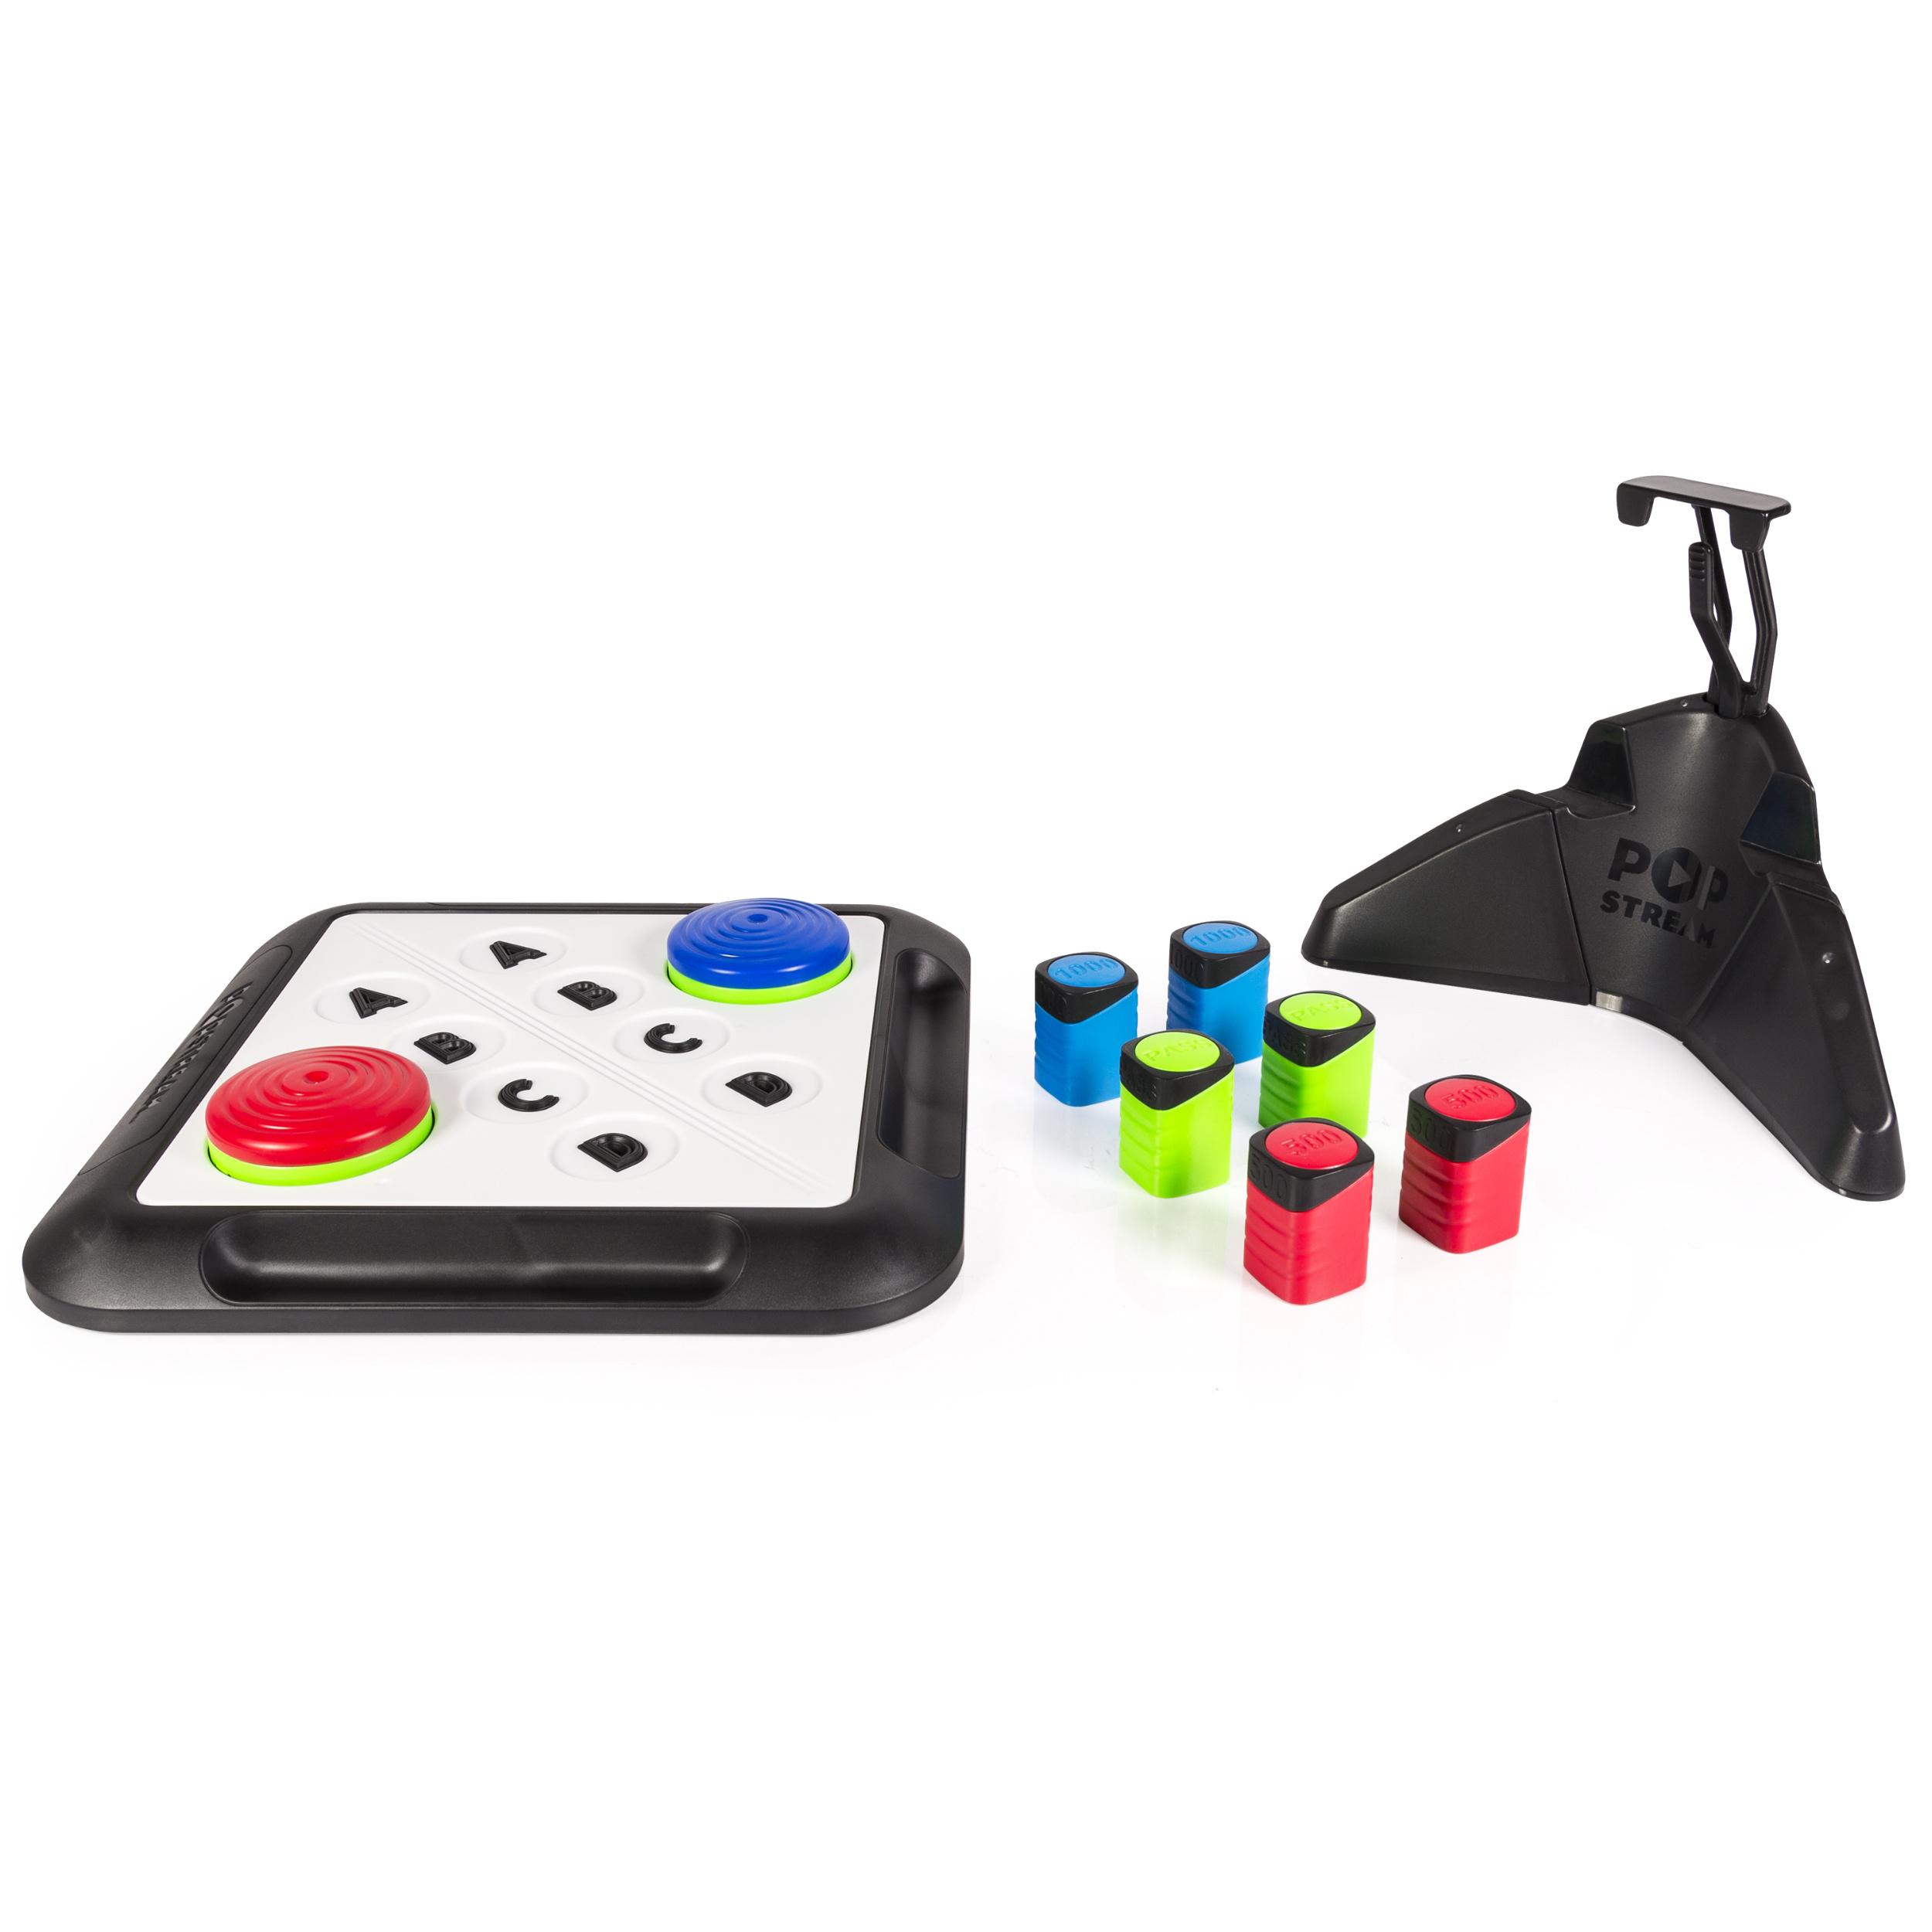 Spin Master Games - Pop Stream Board Game PartNumber: 004W006860326001P KsnValue: 004W006860326001 MfgPartNumber: 6022565